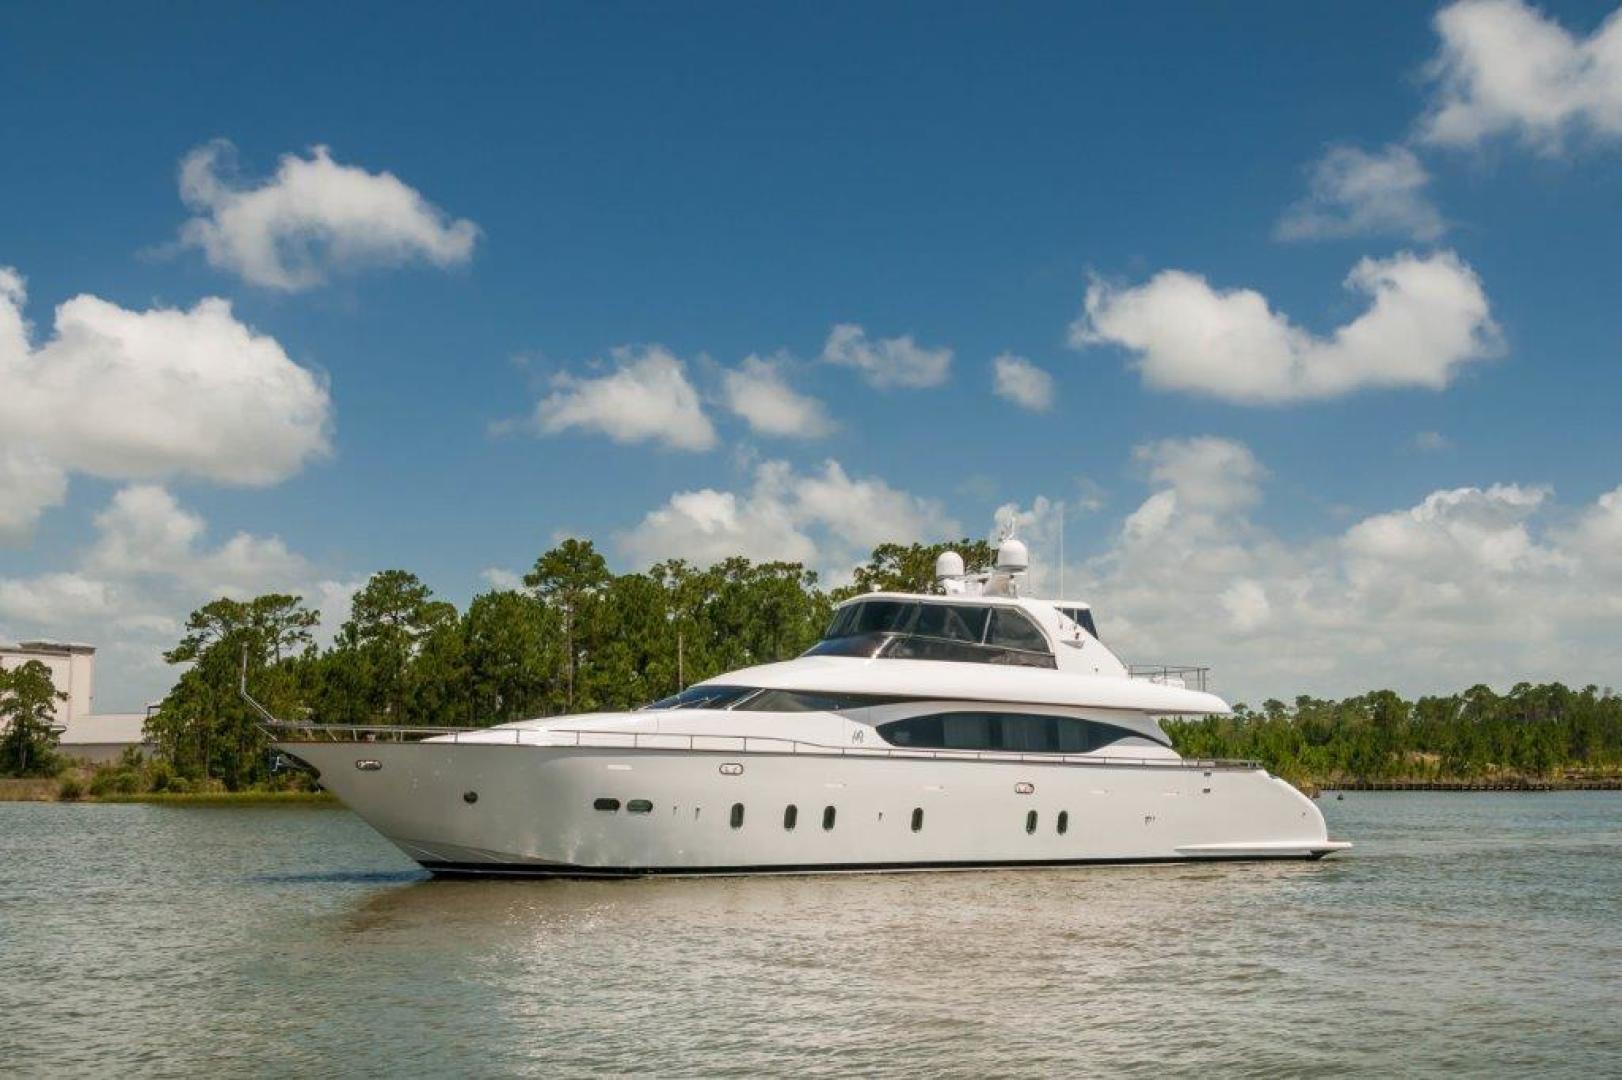 Maiora-84 Motor Yacht 2015-Never Rest SANDESTIN-Florida-United States-2015 Maiora 84 Motor Yacht Never Rest Port Profile-720525 | Thumbnail